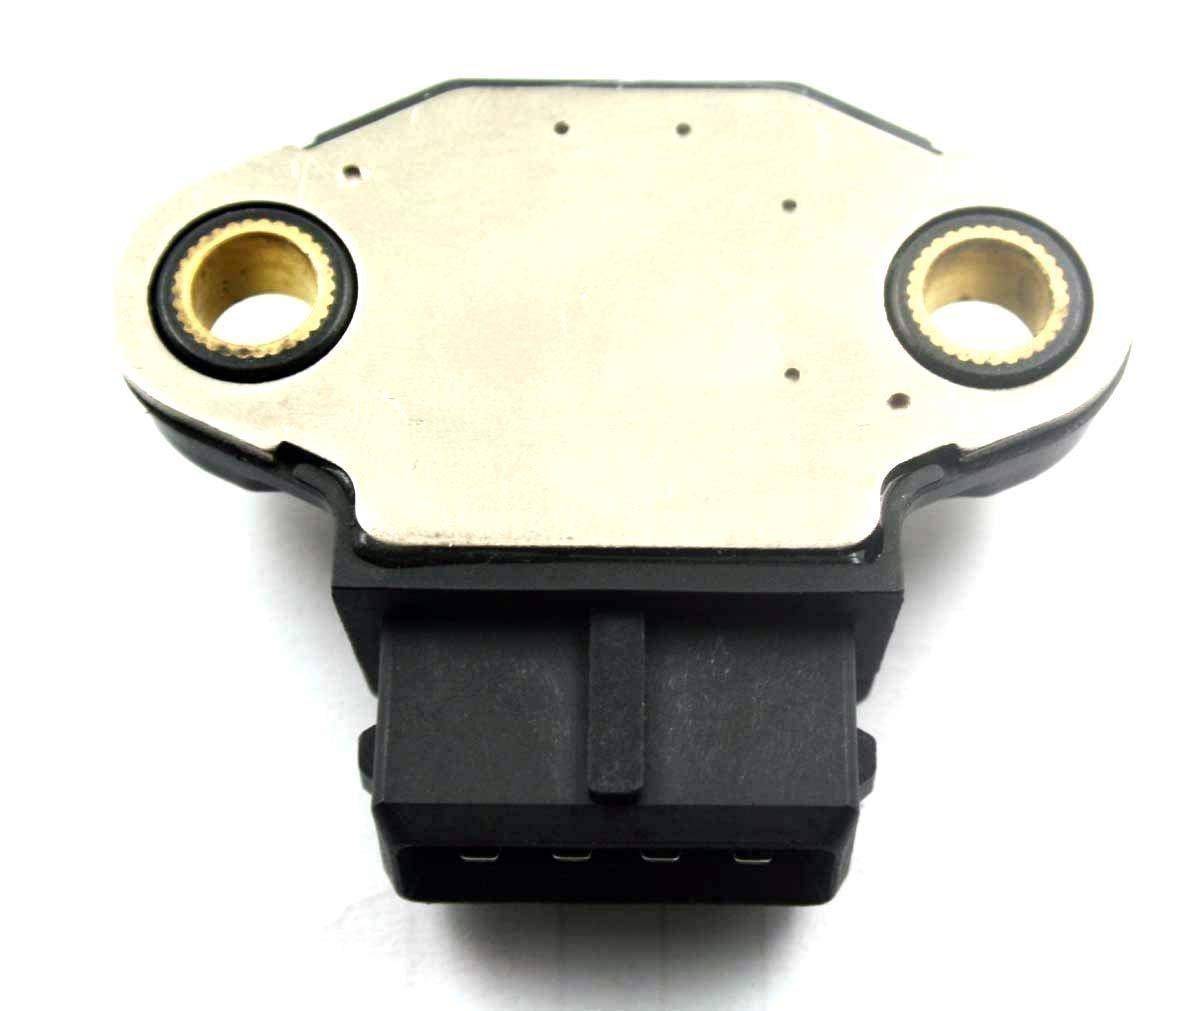 Aquiver Auto Parts New Ignition Failure Sensor for KIA Amanti Sedona Optima Sorento Replaces Part Number 27370-38000 27370-38010 by Aquiver Auto Parts